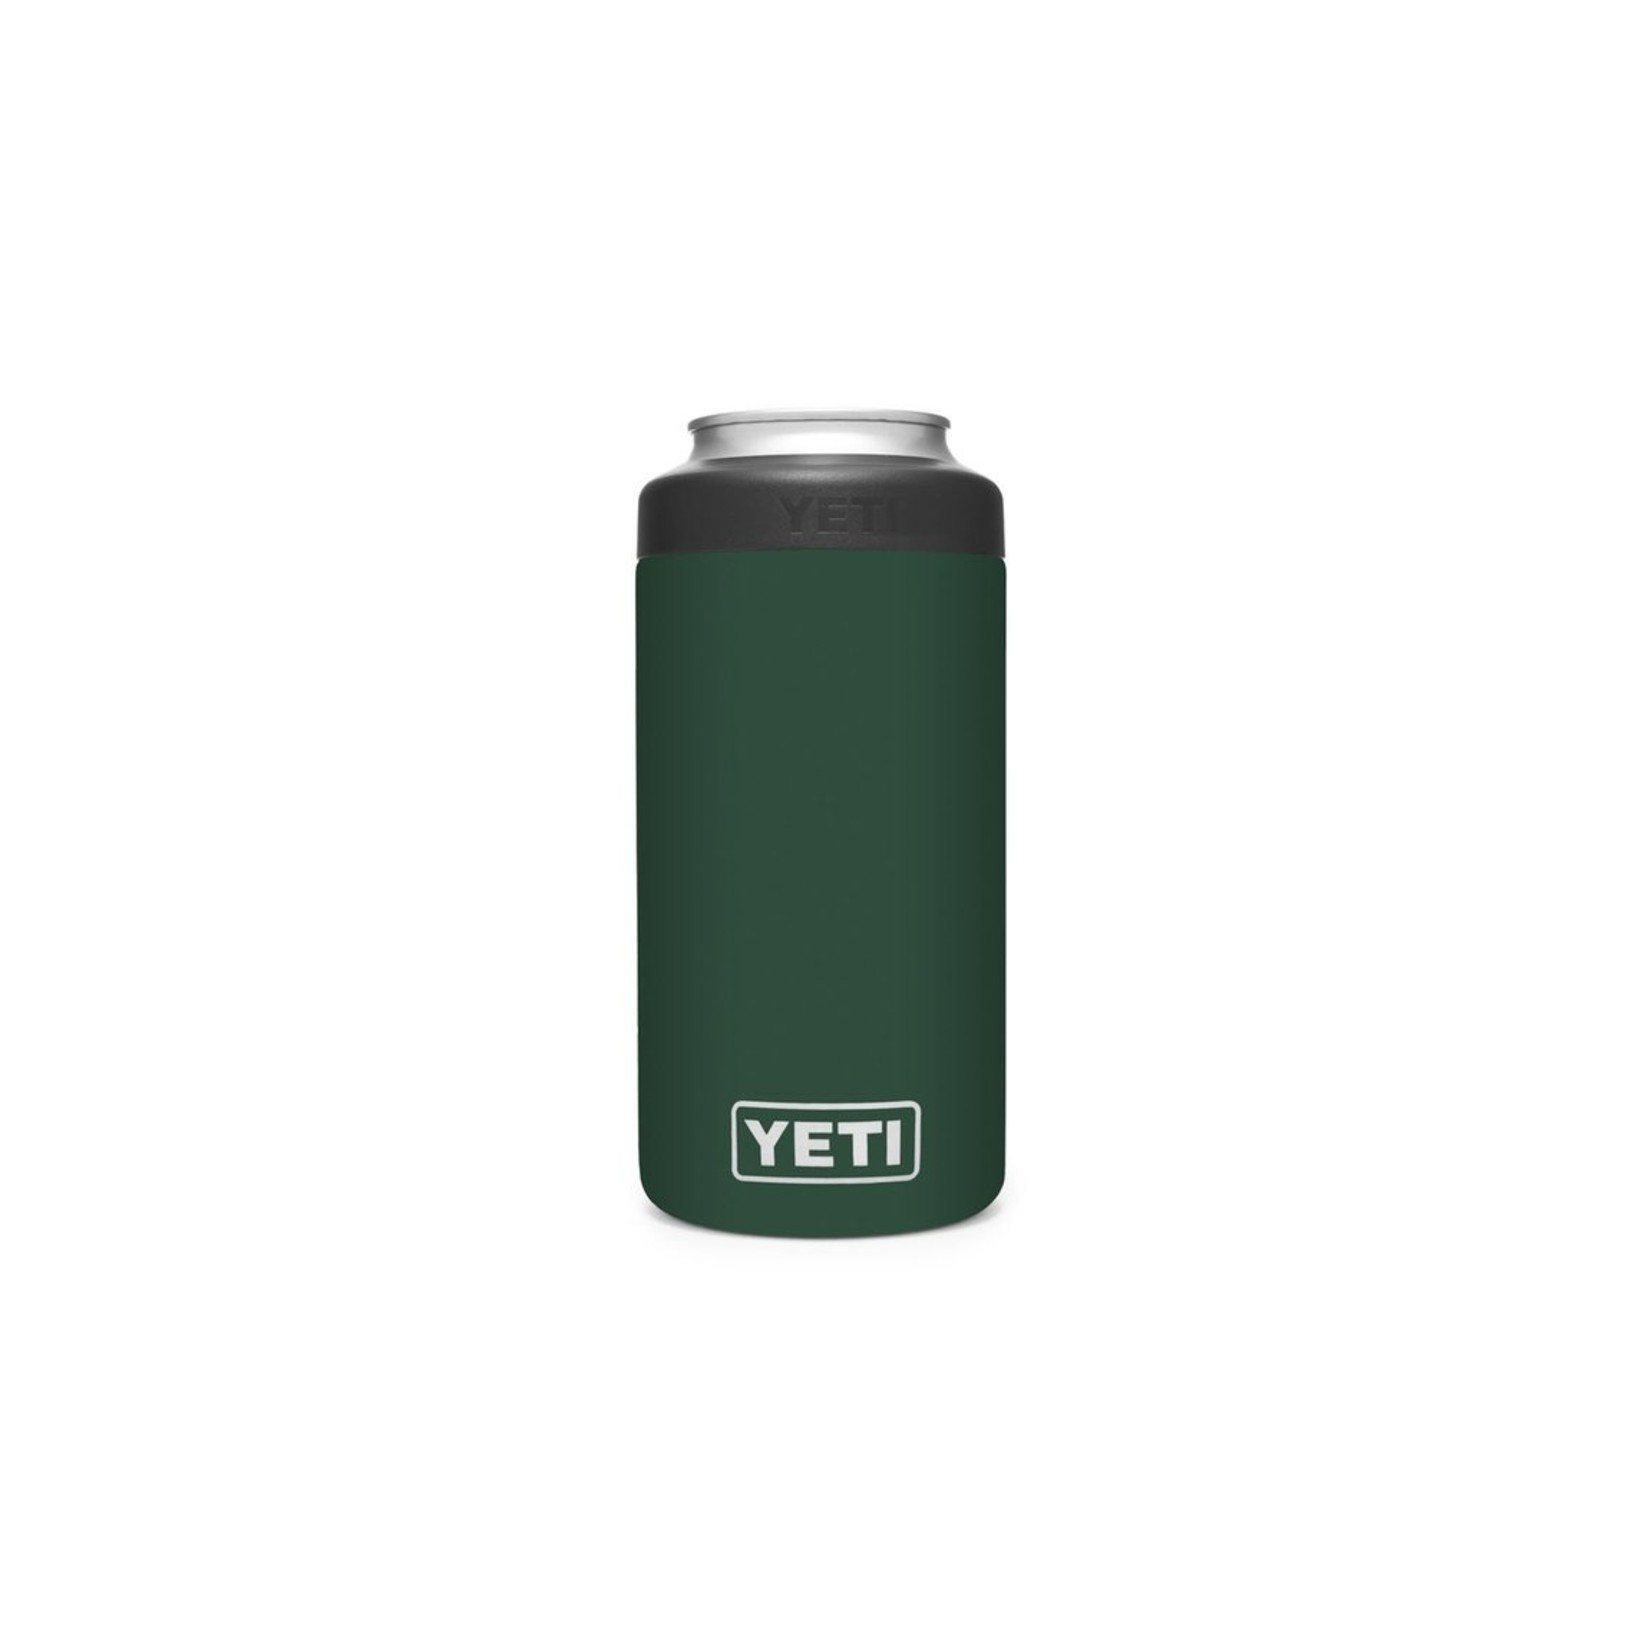 Yeti Yeti Rambler 16 Oz Colster Tall Can Insulator